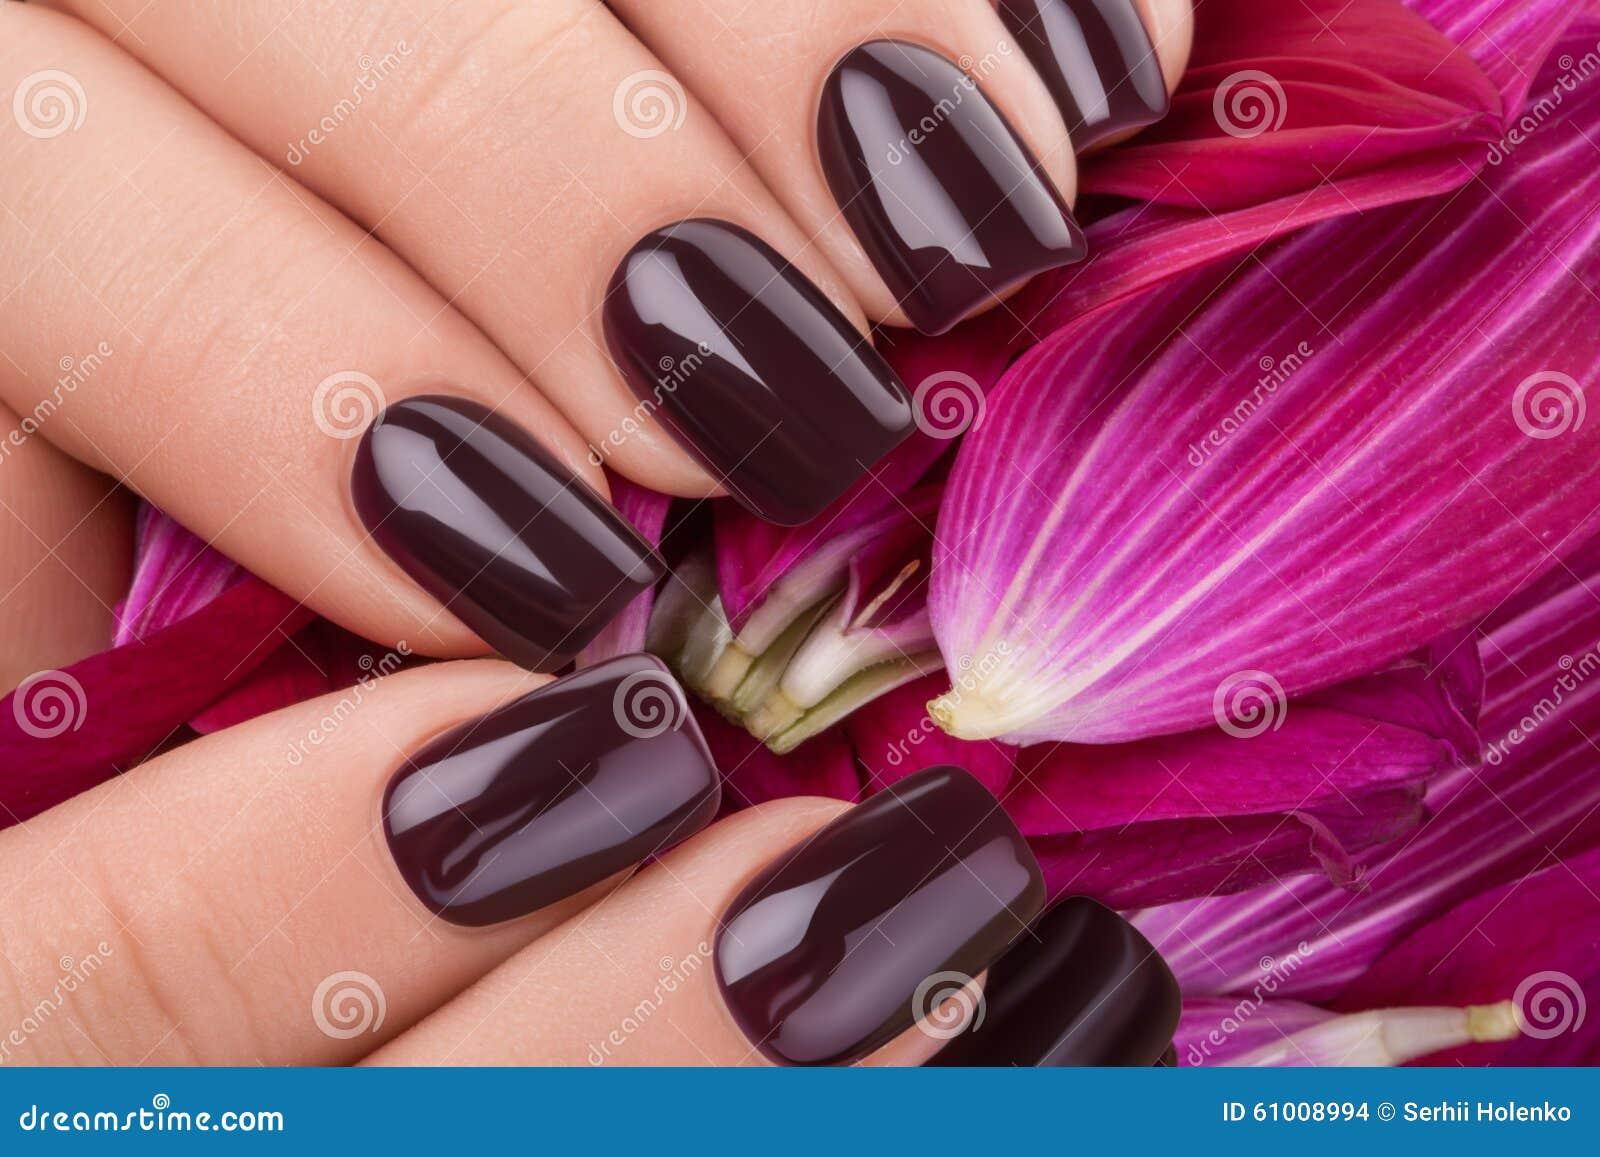 Dark red nail polish. stock photo. Image of closeup, acrylic - 61008994